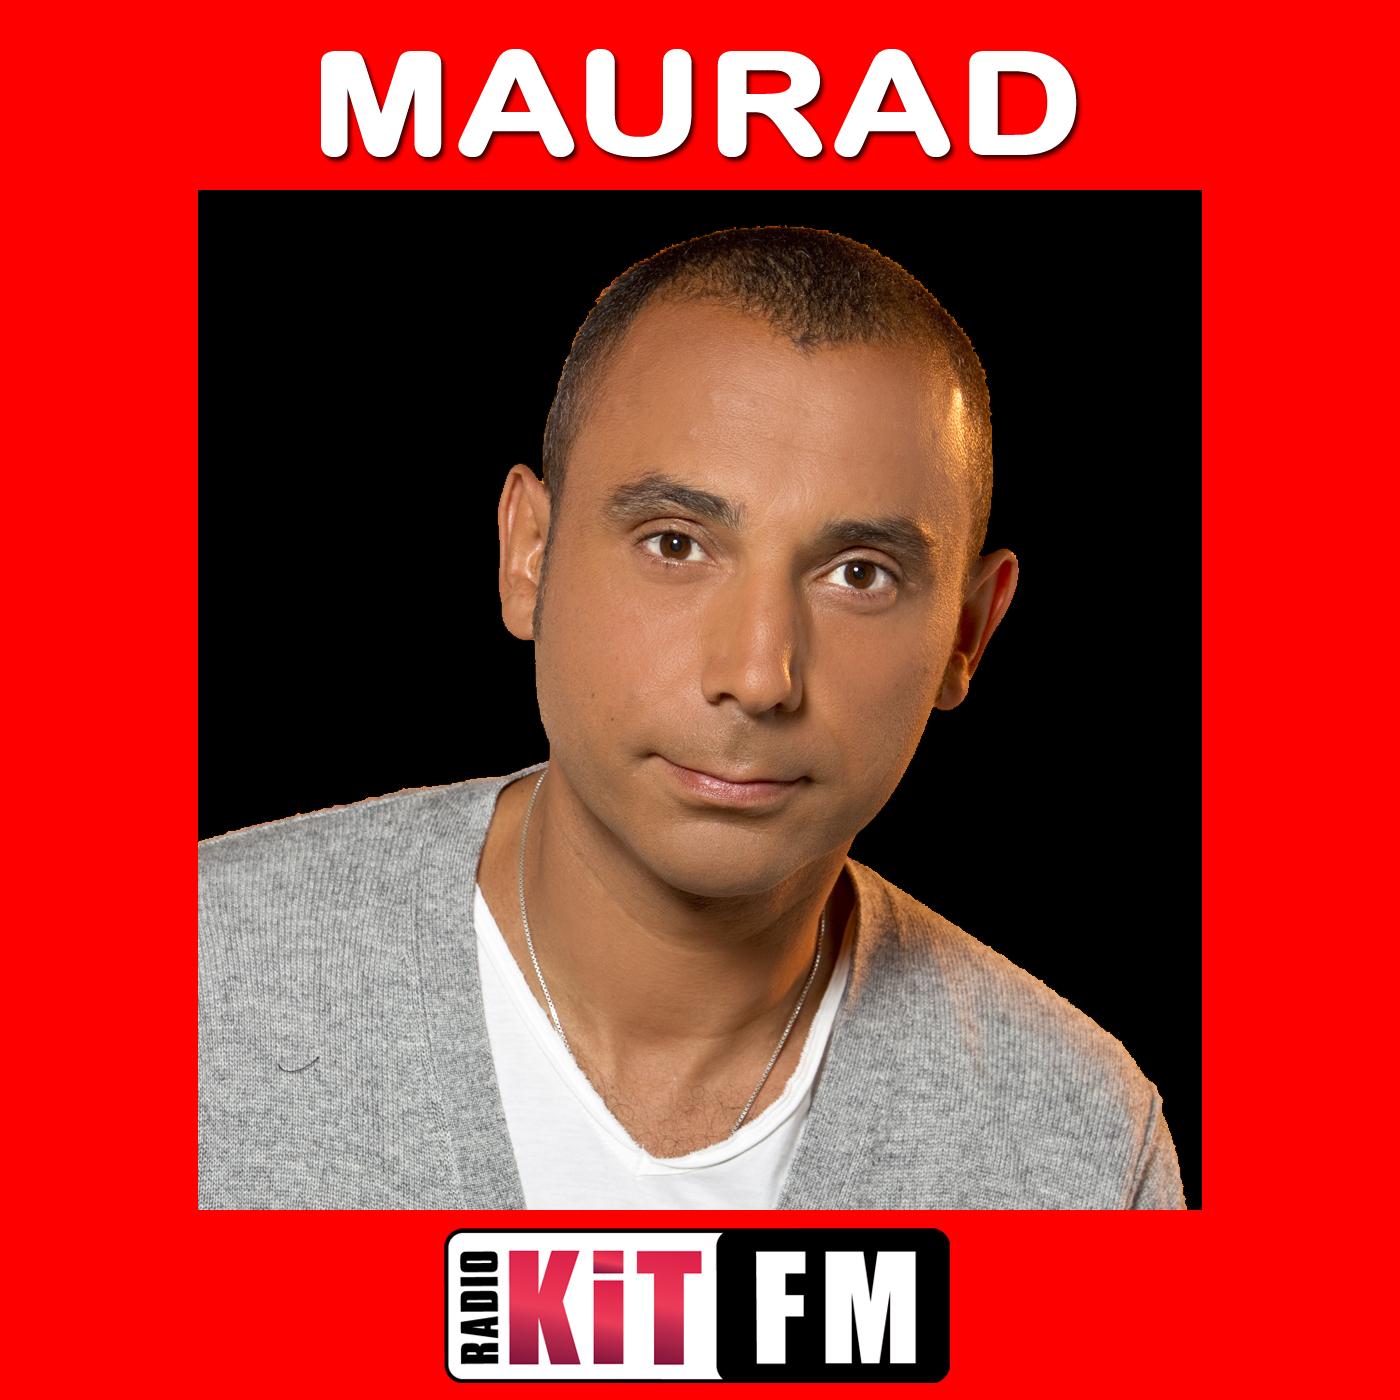 Kit FM : Avis a la population avec Maurad